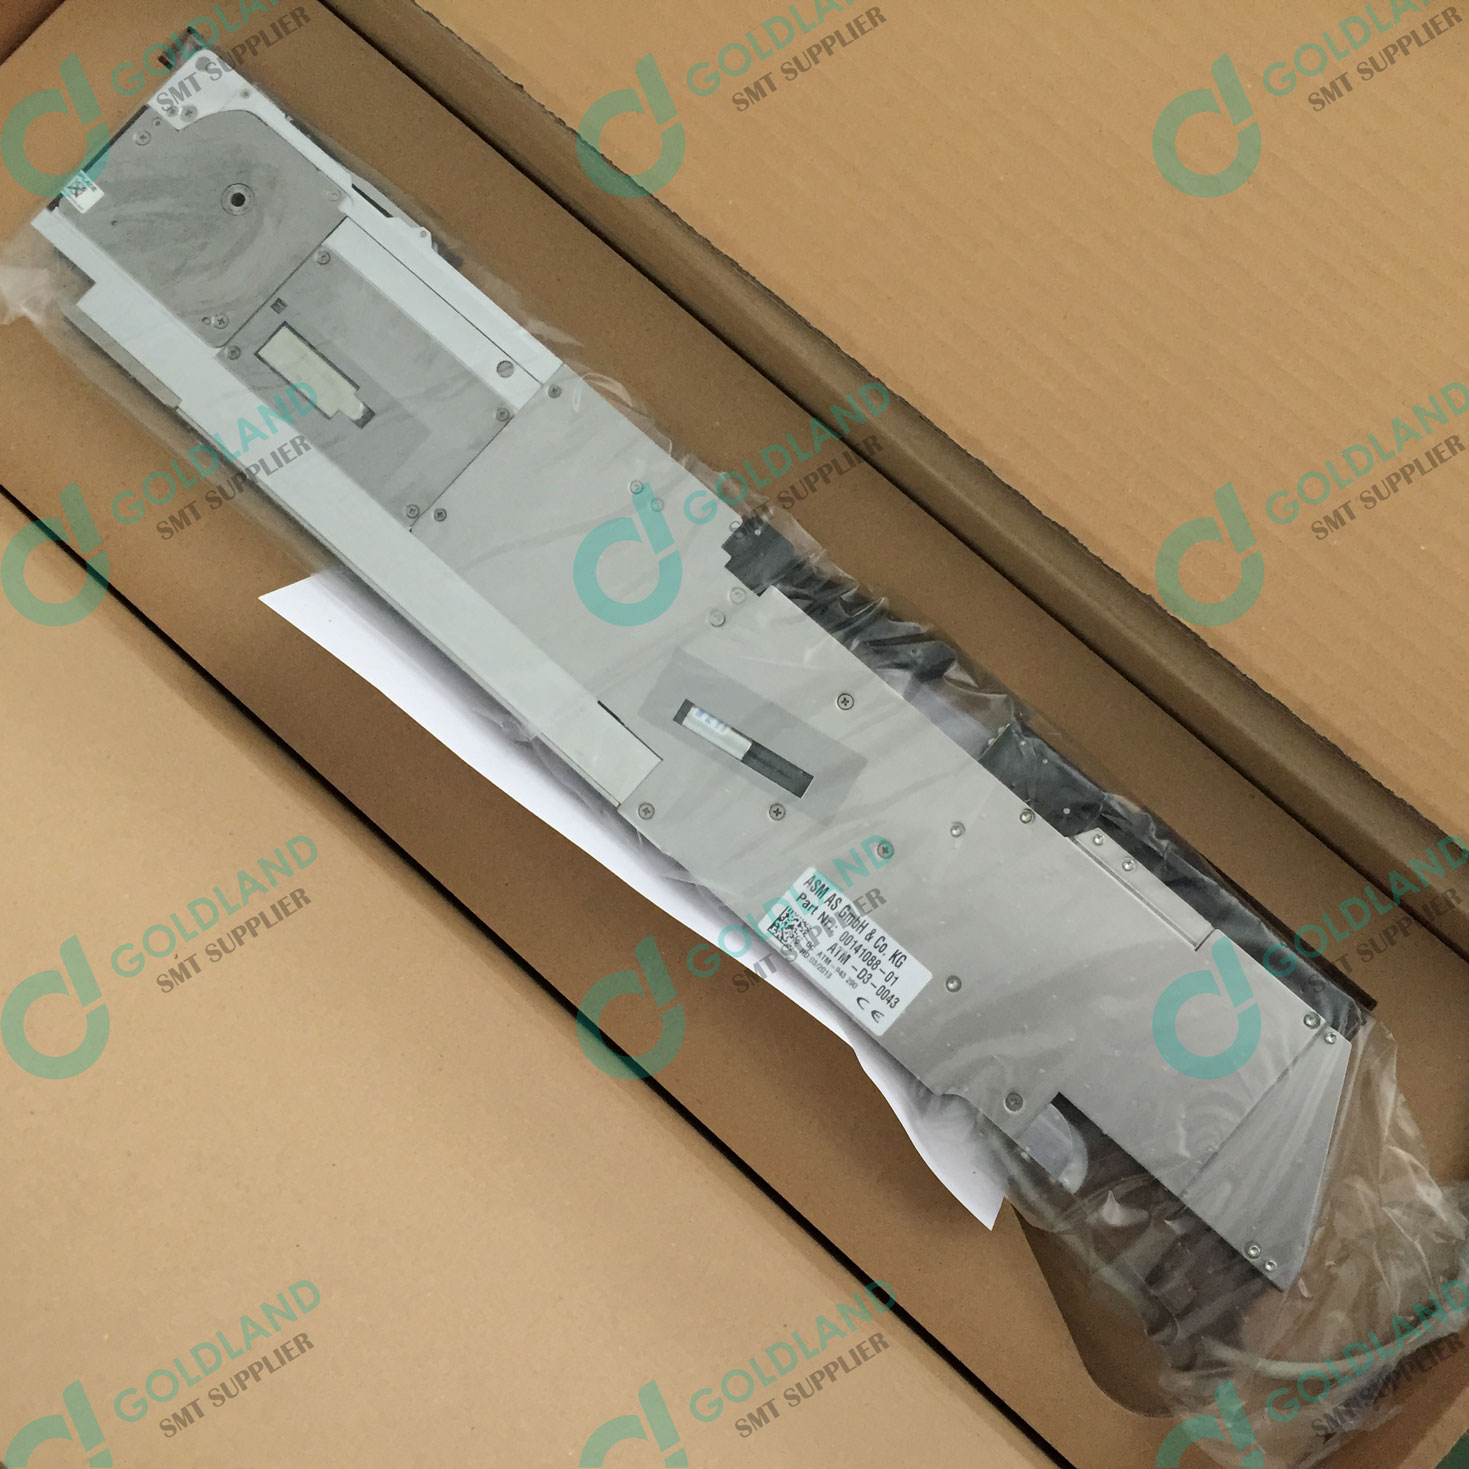 00141088-01 Siemens S 3x8mm ShutterLess Feeder module